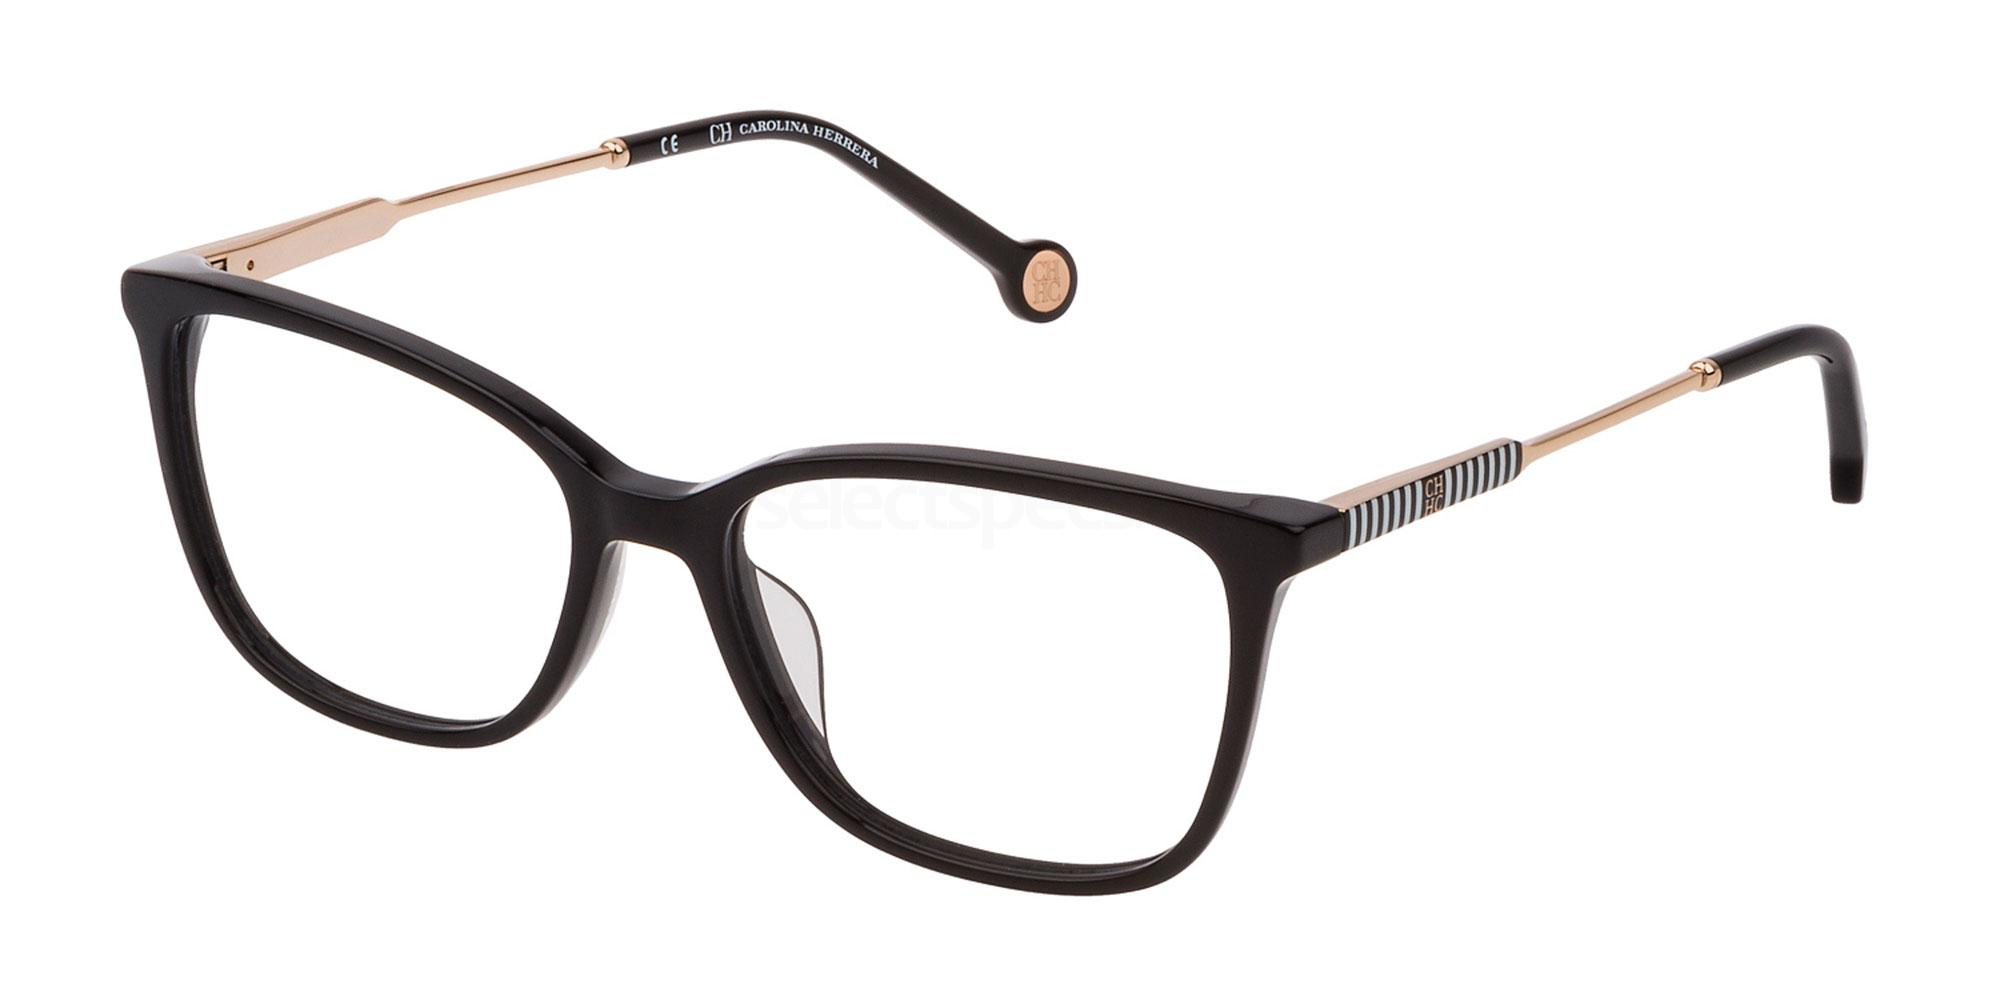 0700 VHE816 Glasses, CH Carolina Herrera